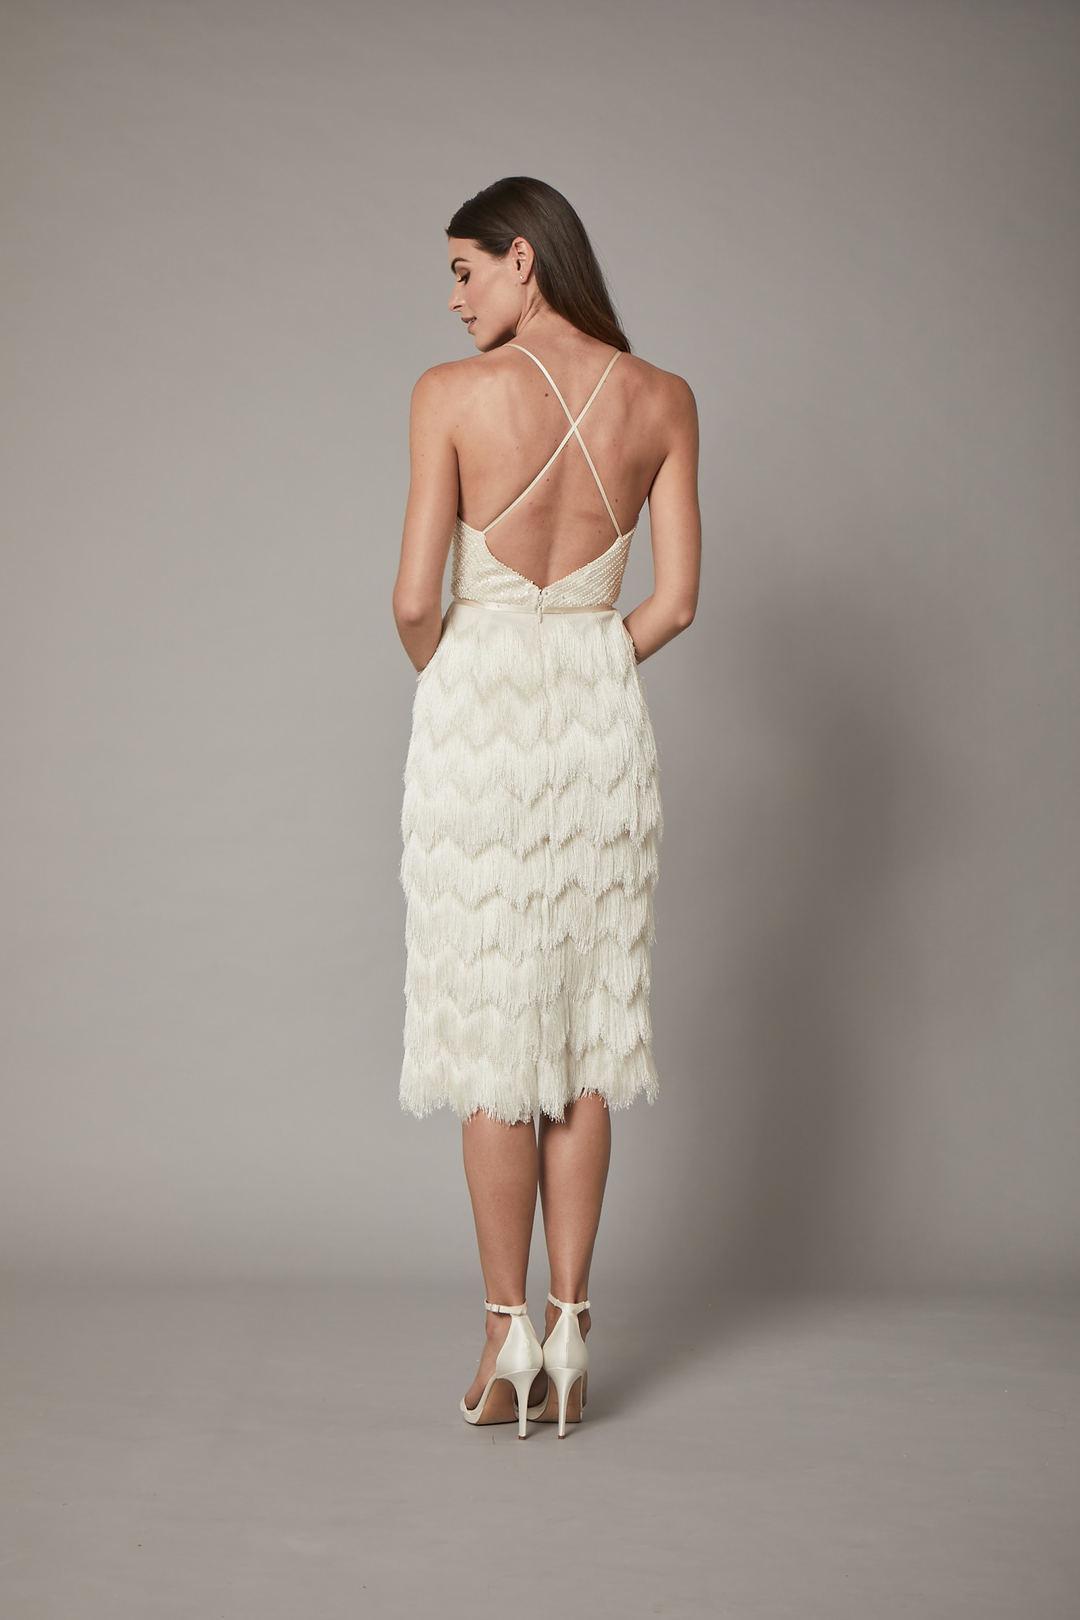 ryder dress dress photo